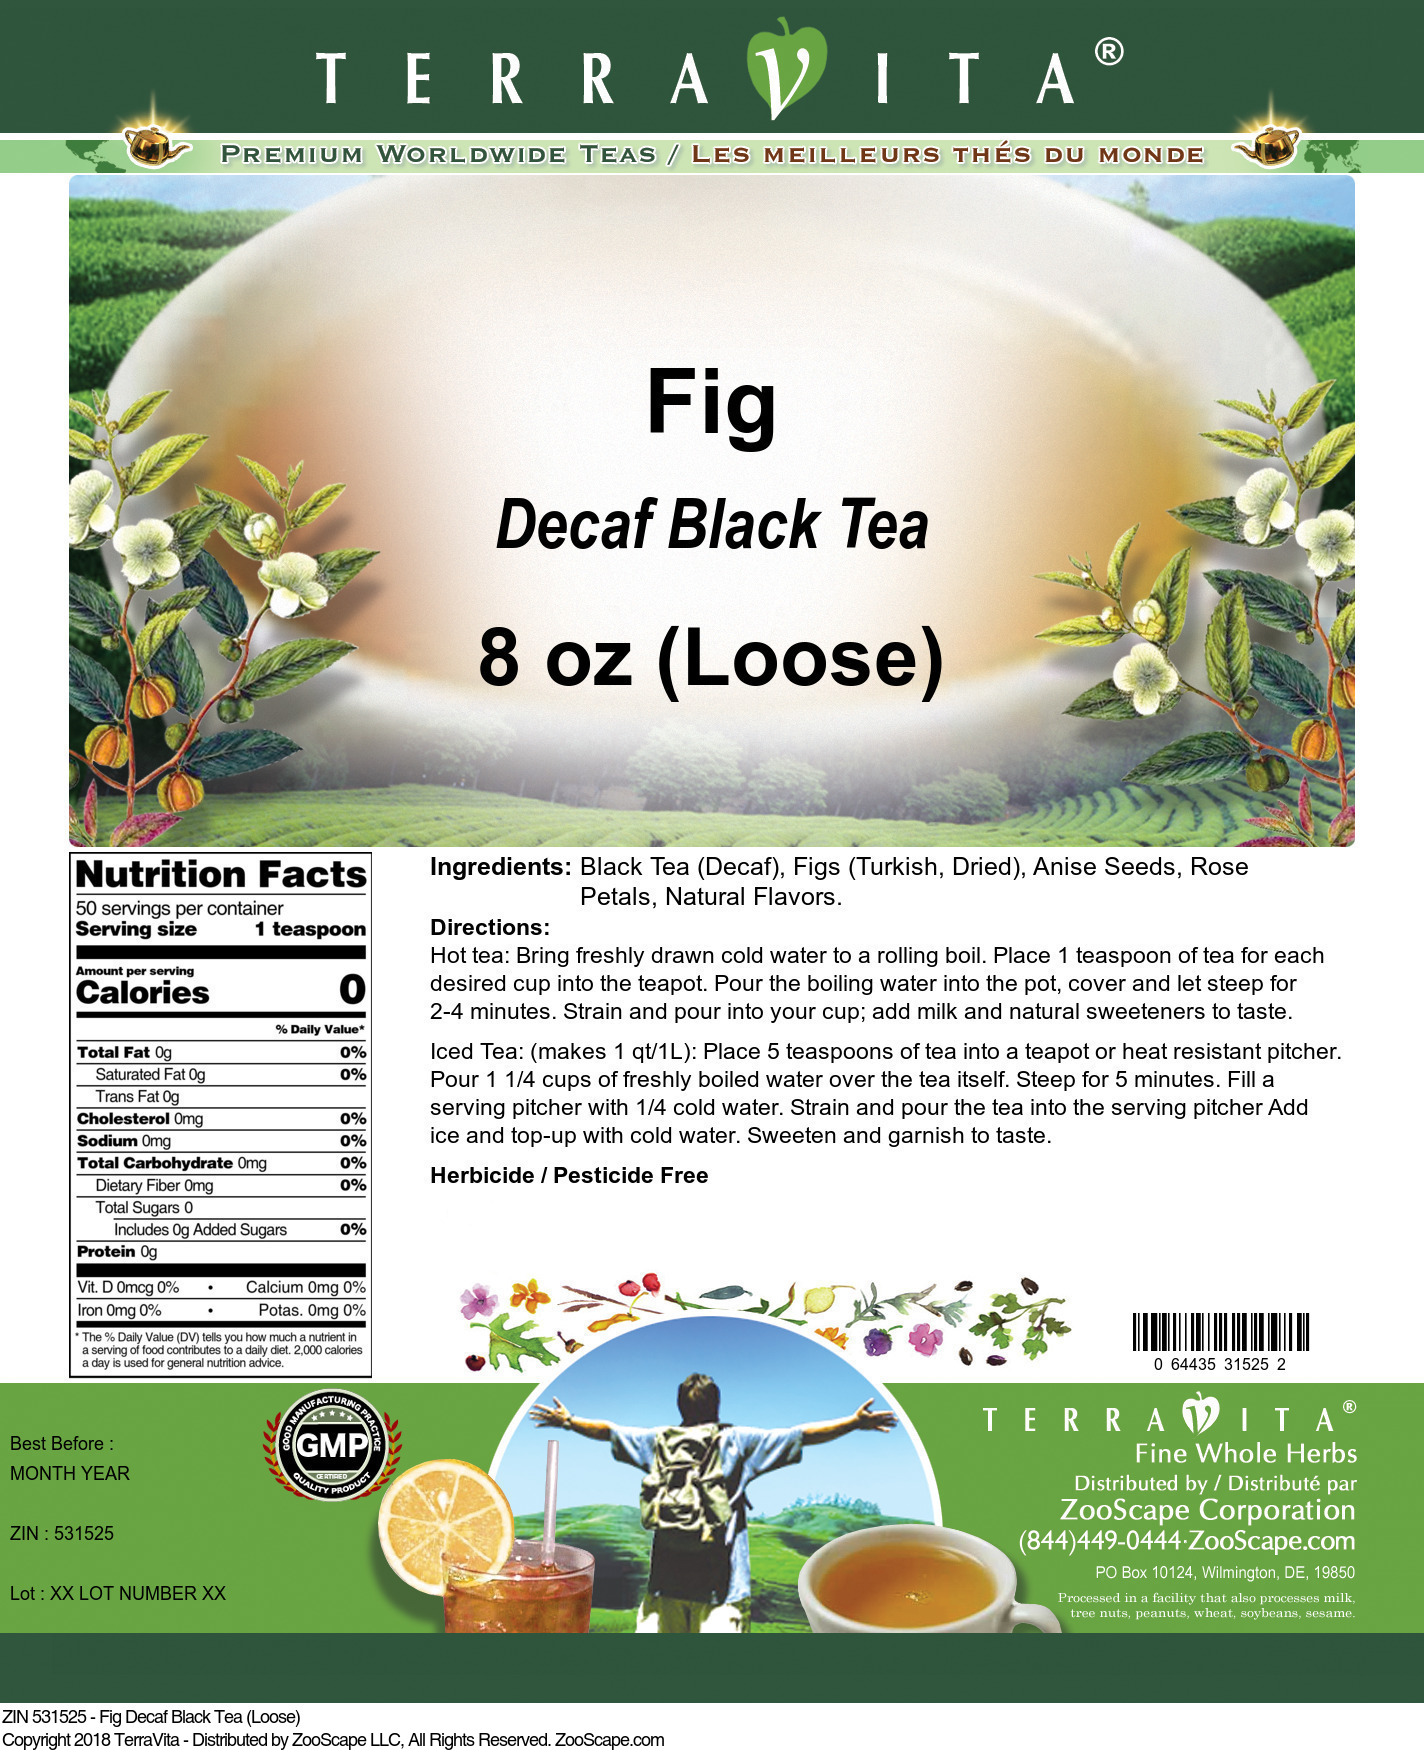 Fig Decaf Black Tea